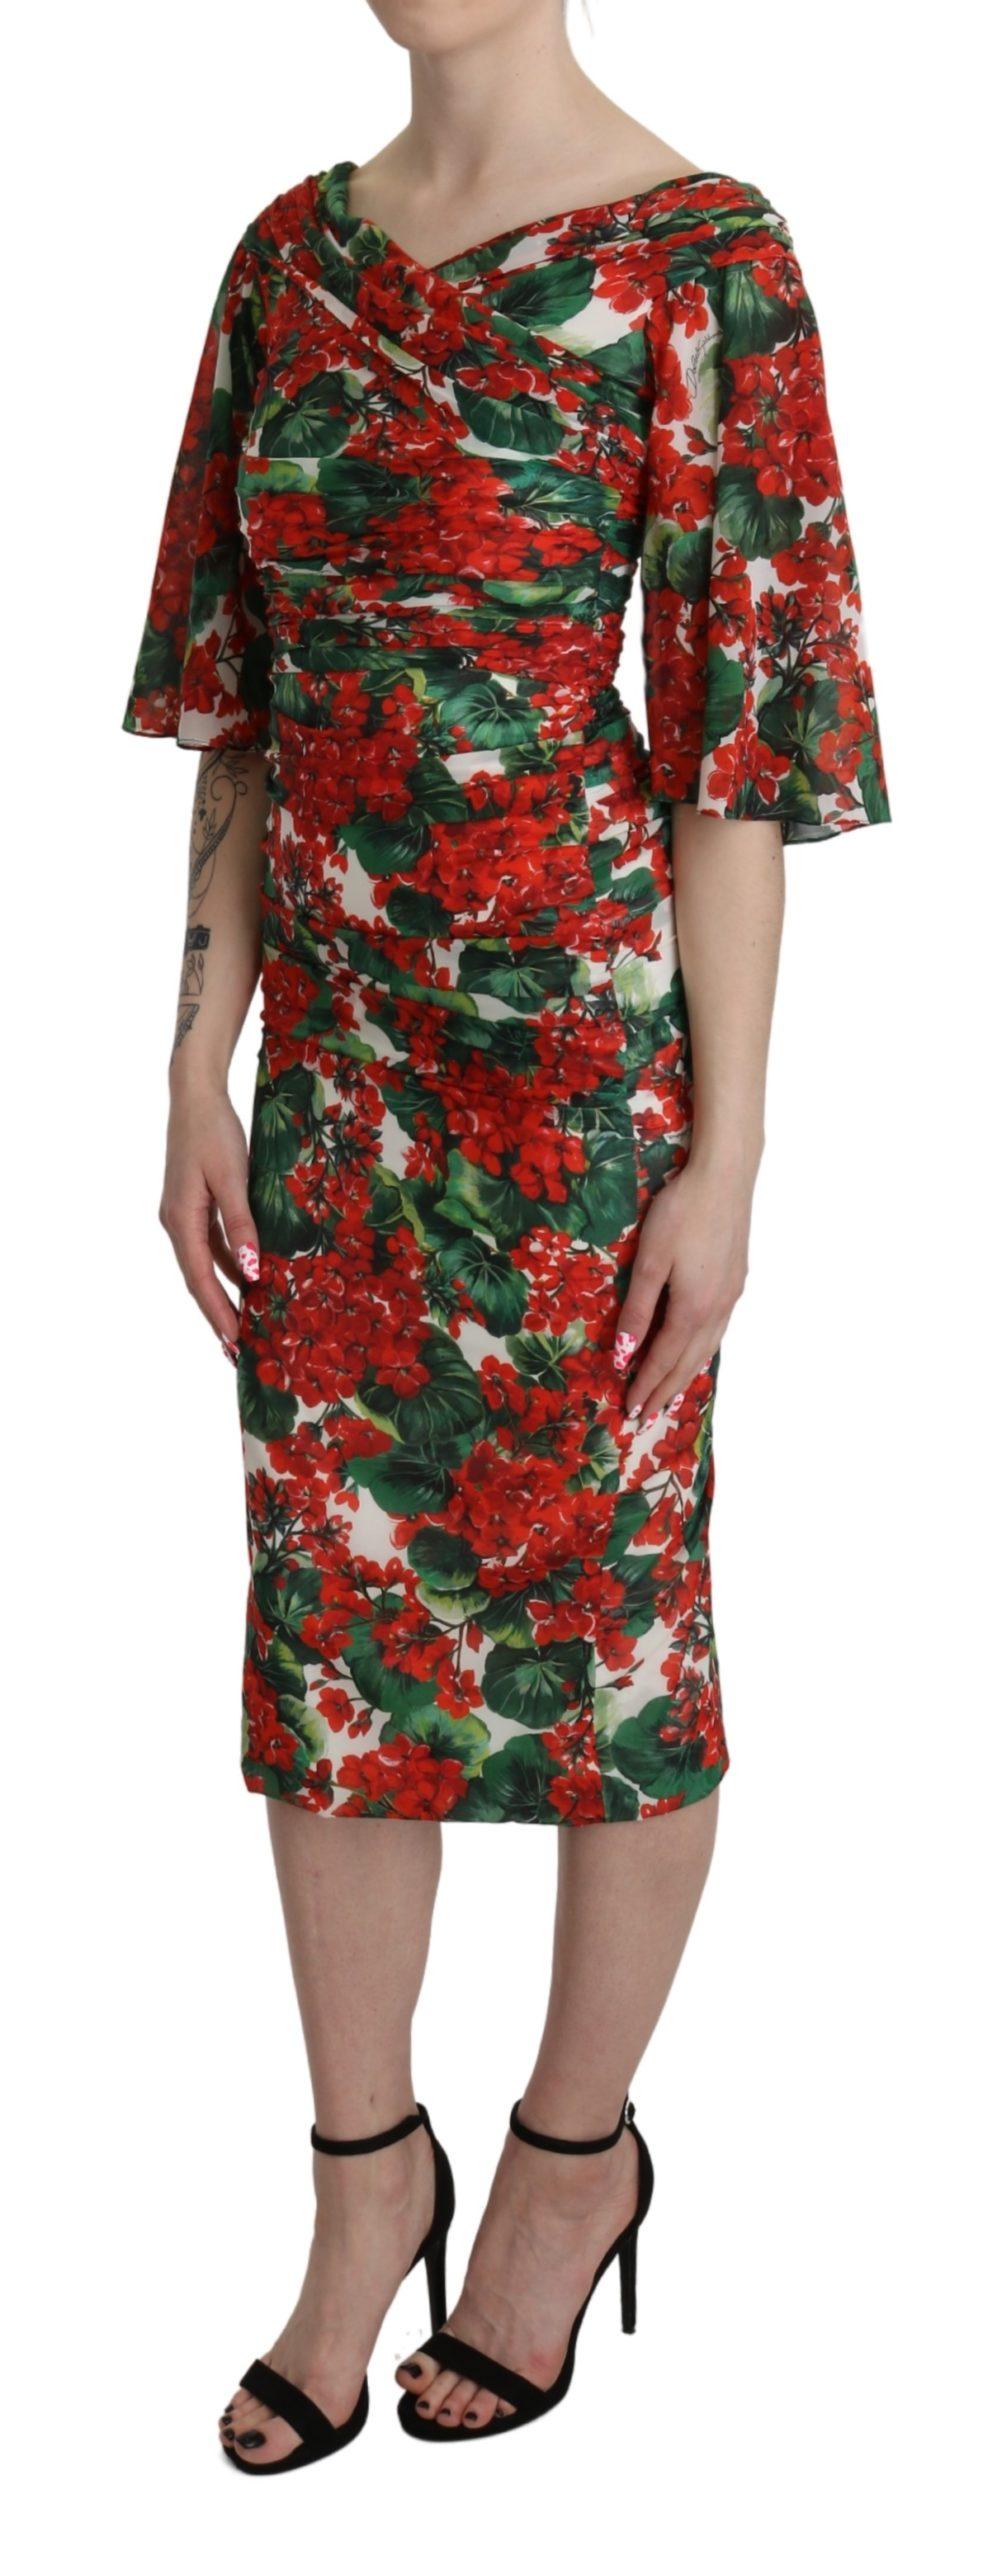 Dolce & Gabbana Women's Floral Midi Silk Dress Multicolor DR2617 - IT38|XS